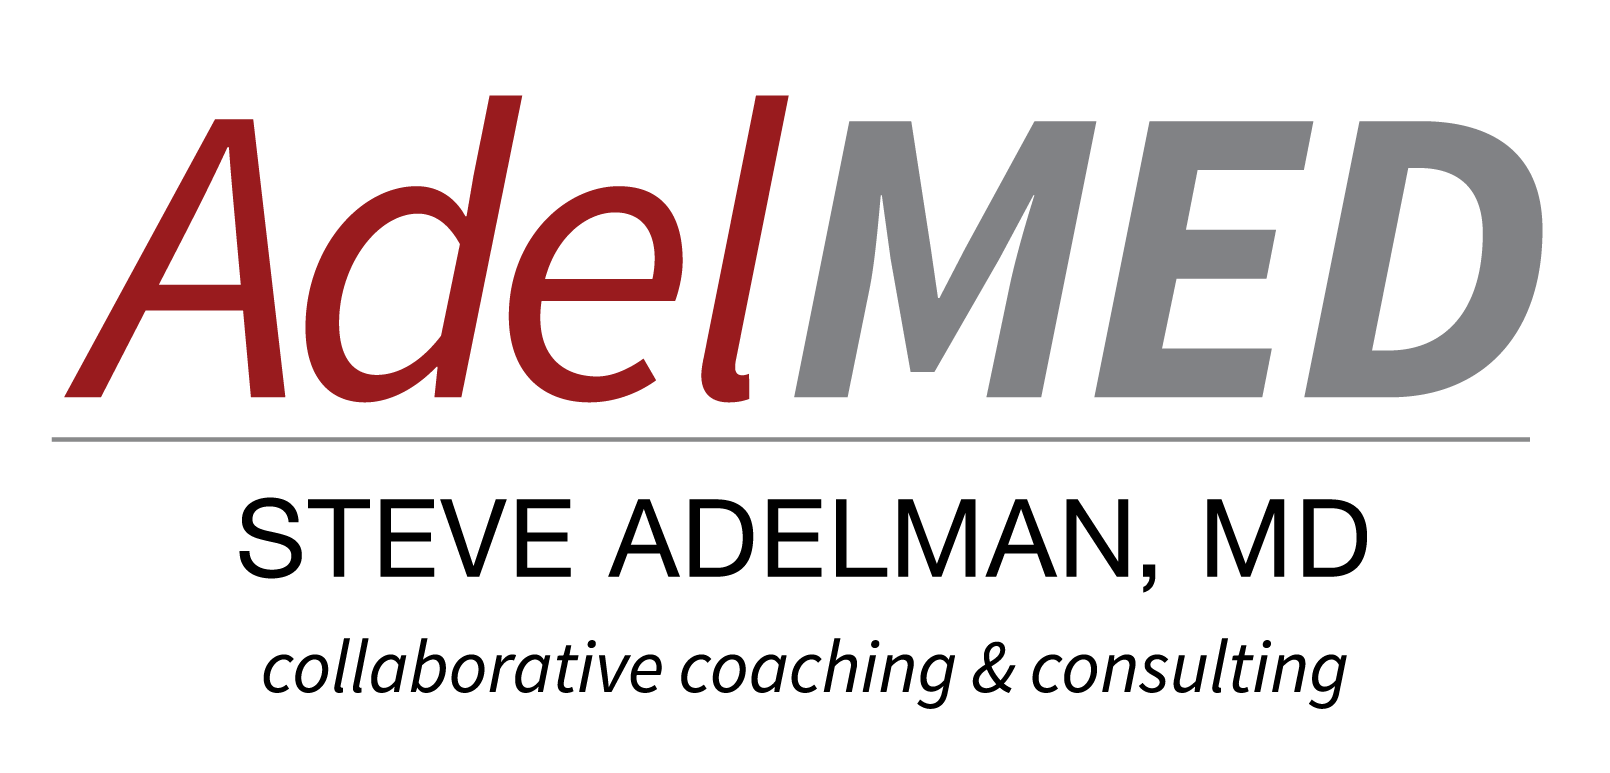 AdelMED.com